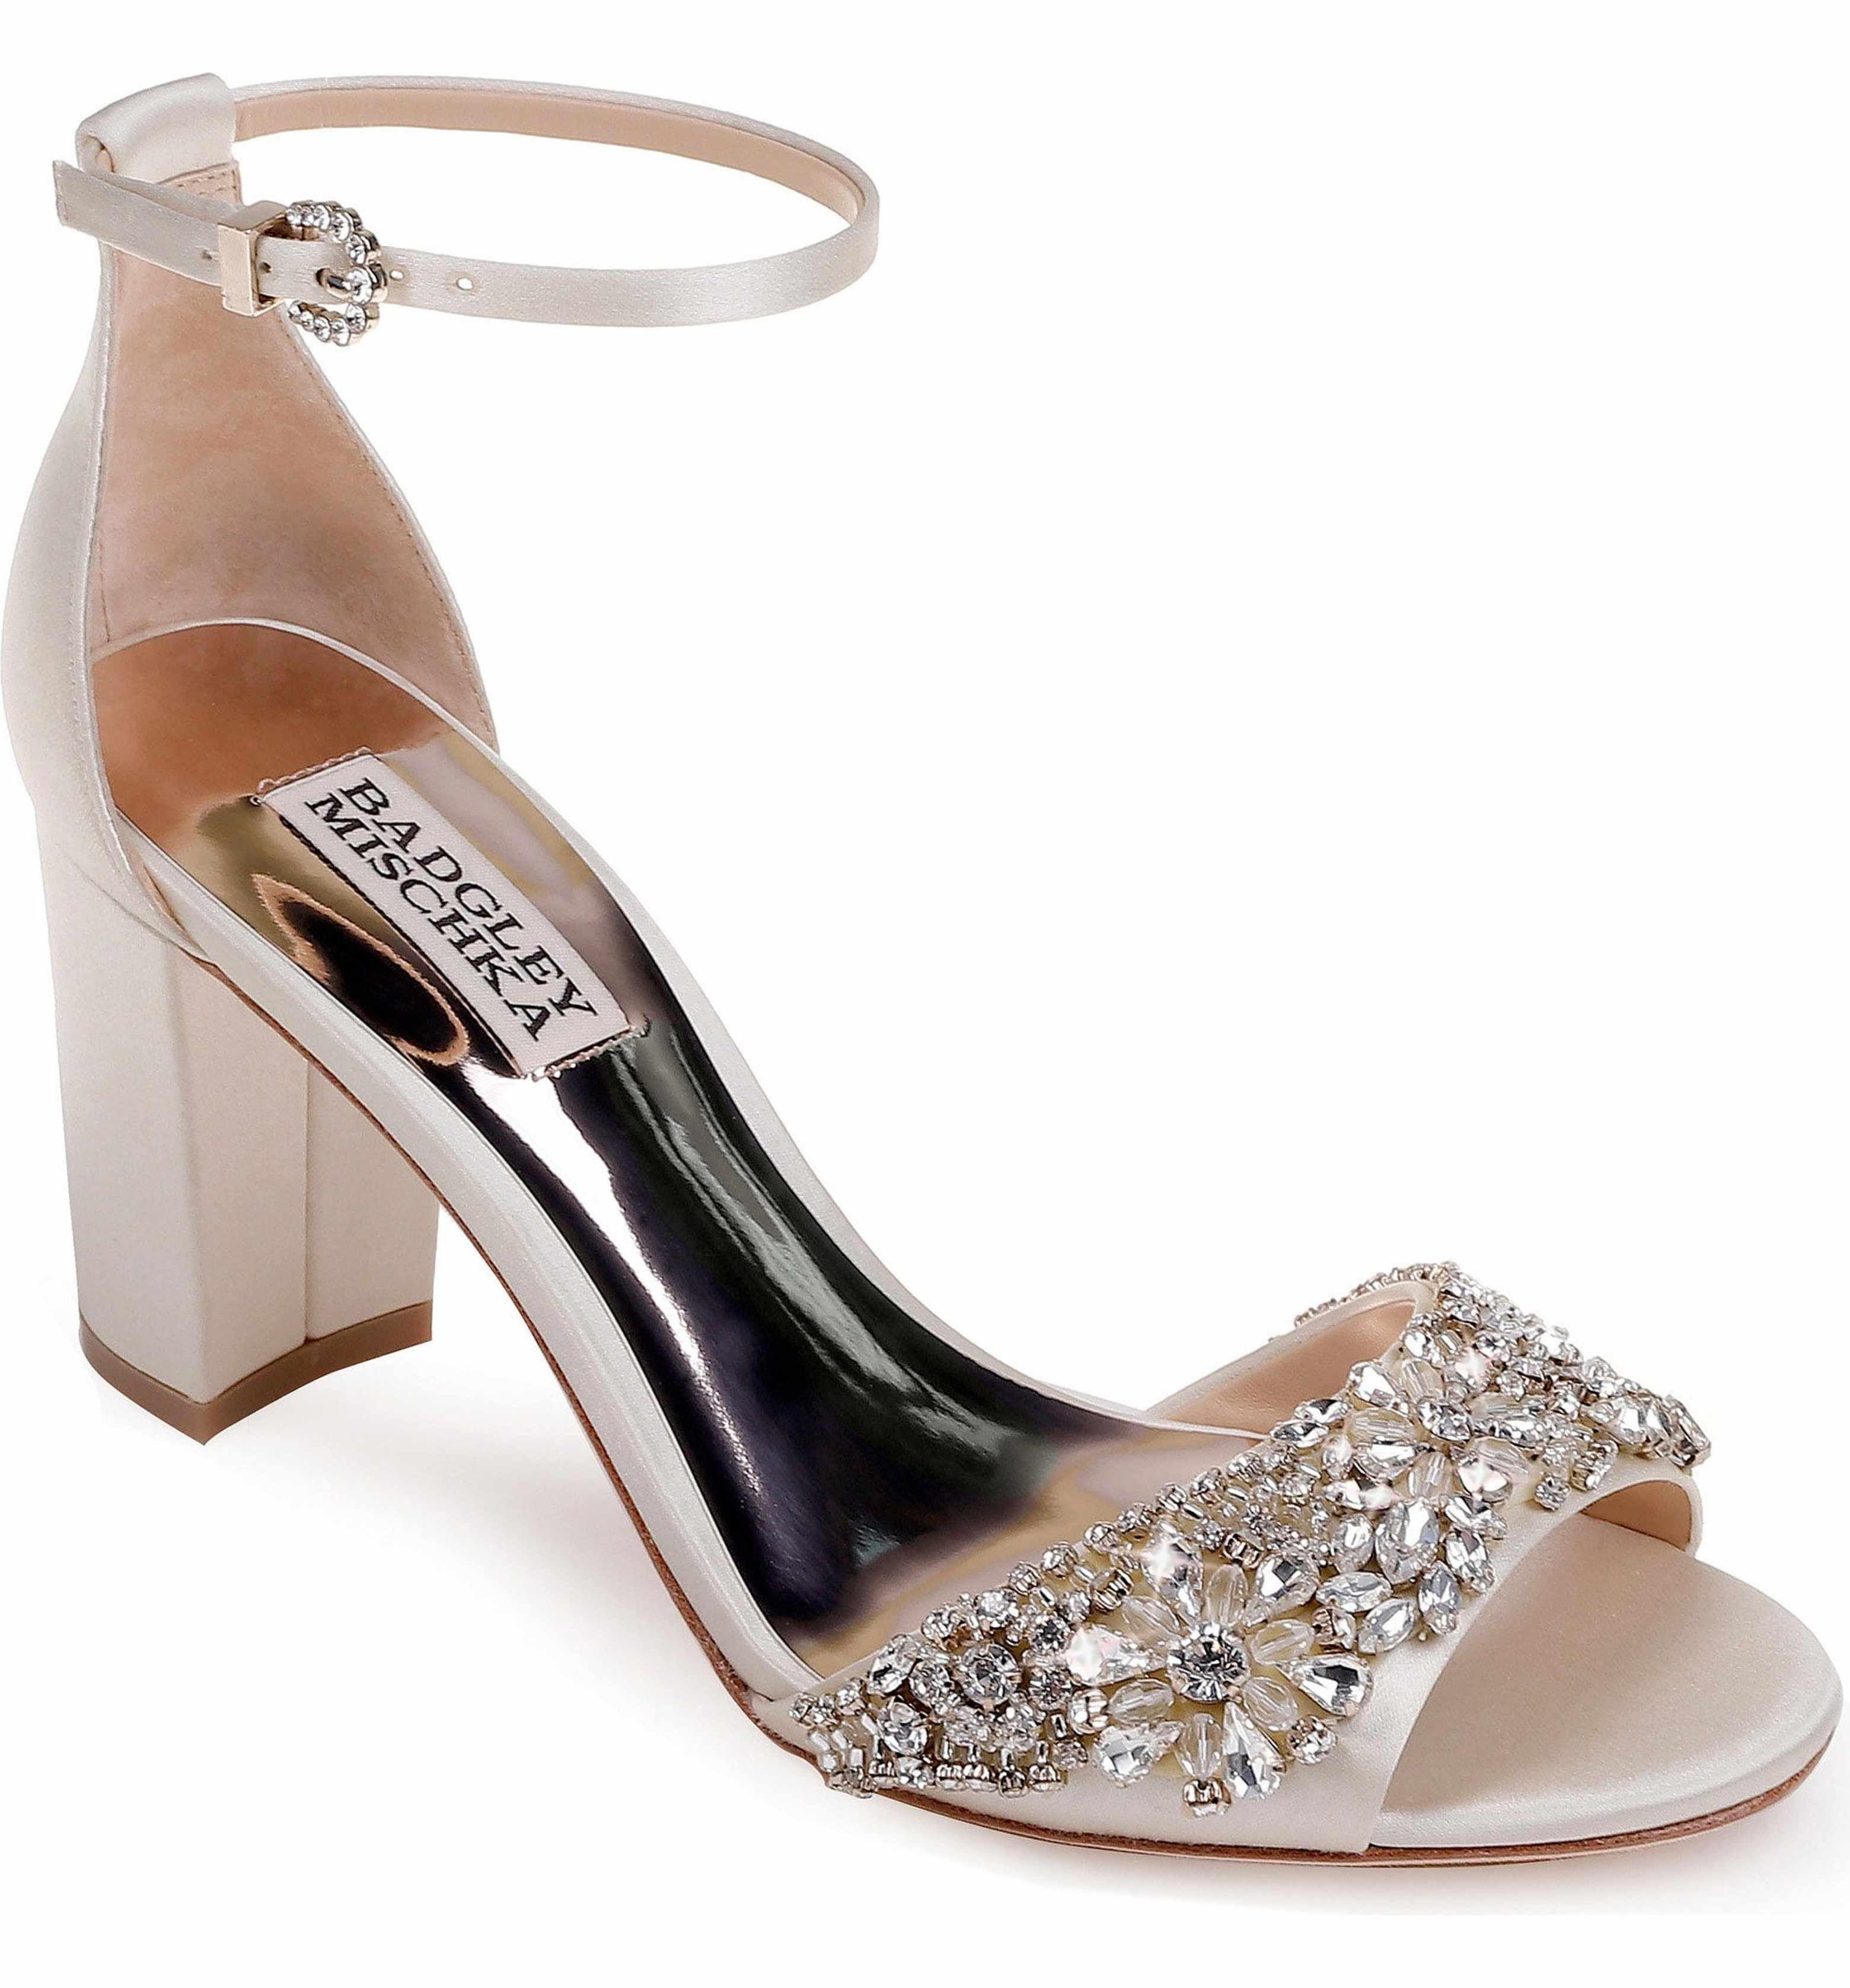 8e7a7d1dd00b Main Image - Badgley Mischka Hines Embellished Block Heel Sandal (Women)